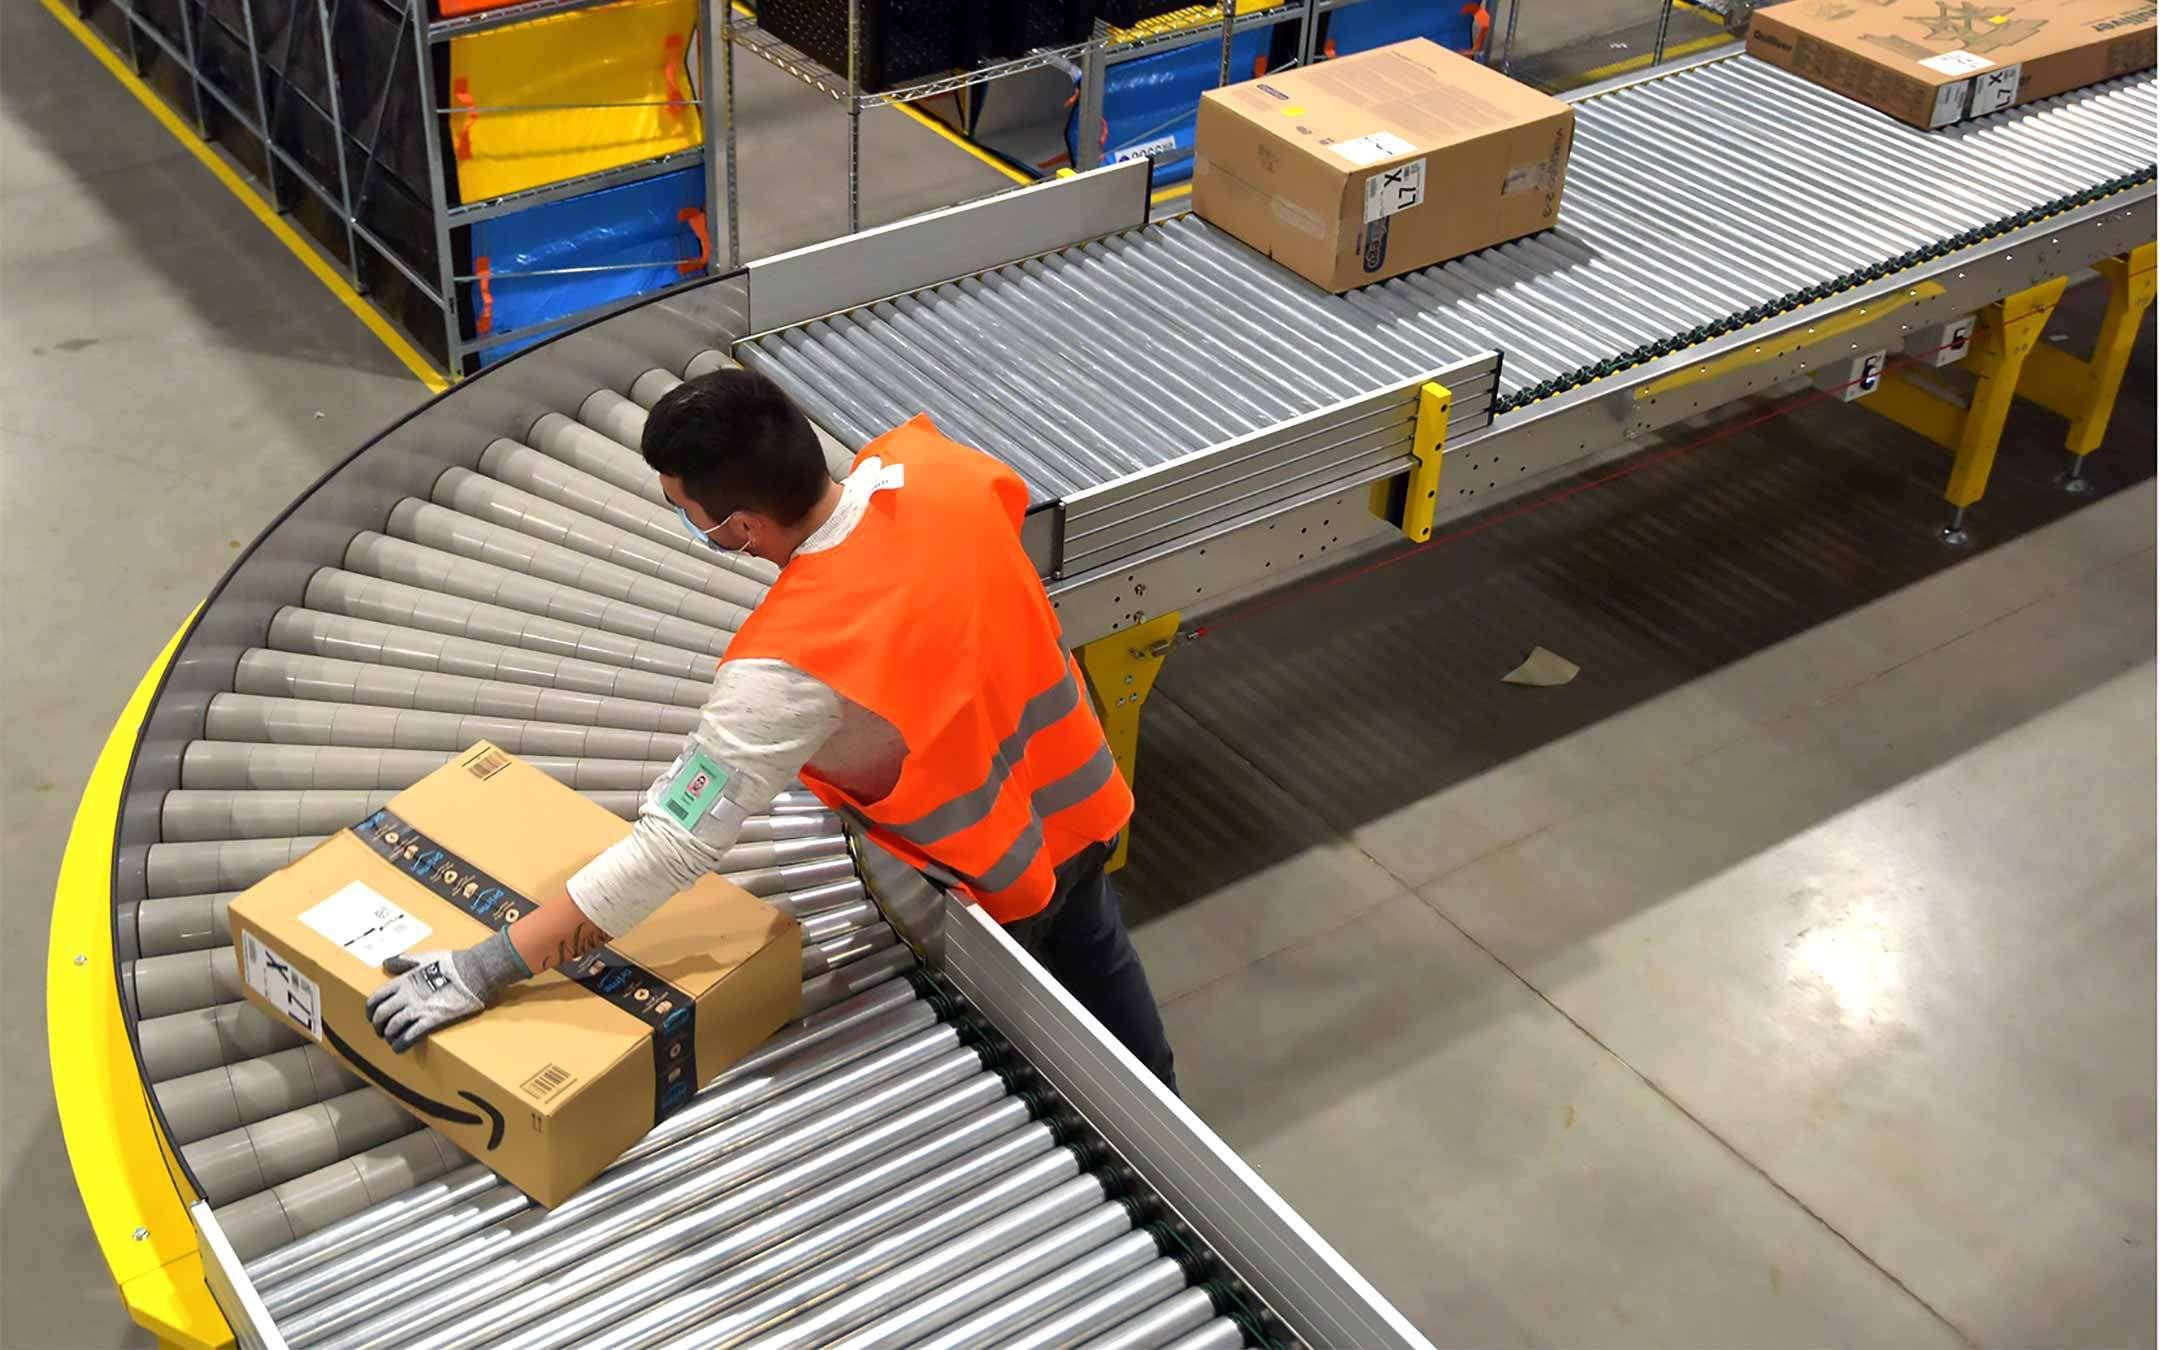 Amazon opens sorting depot in Mezzate